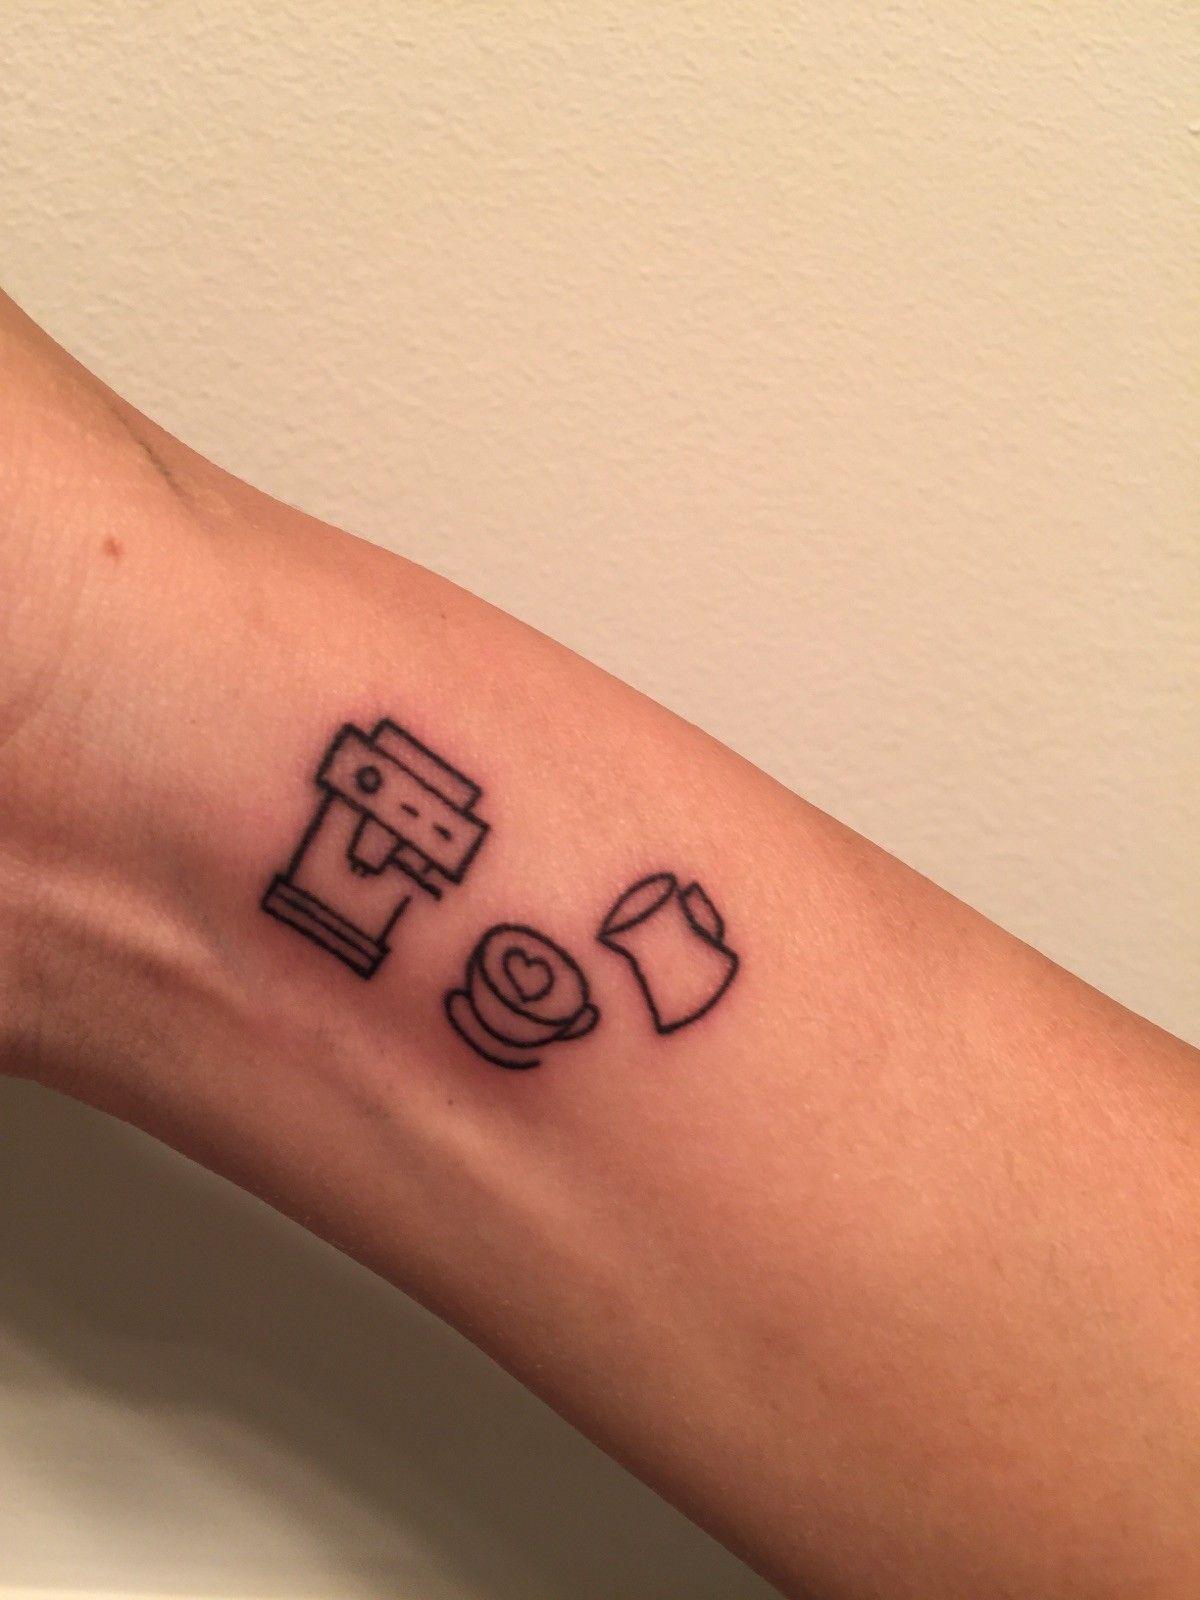 My little coffee machine & coffee cup tattoo :) ☕☕